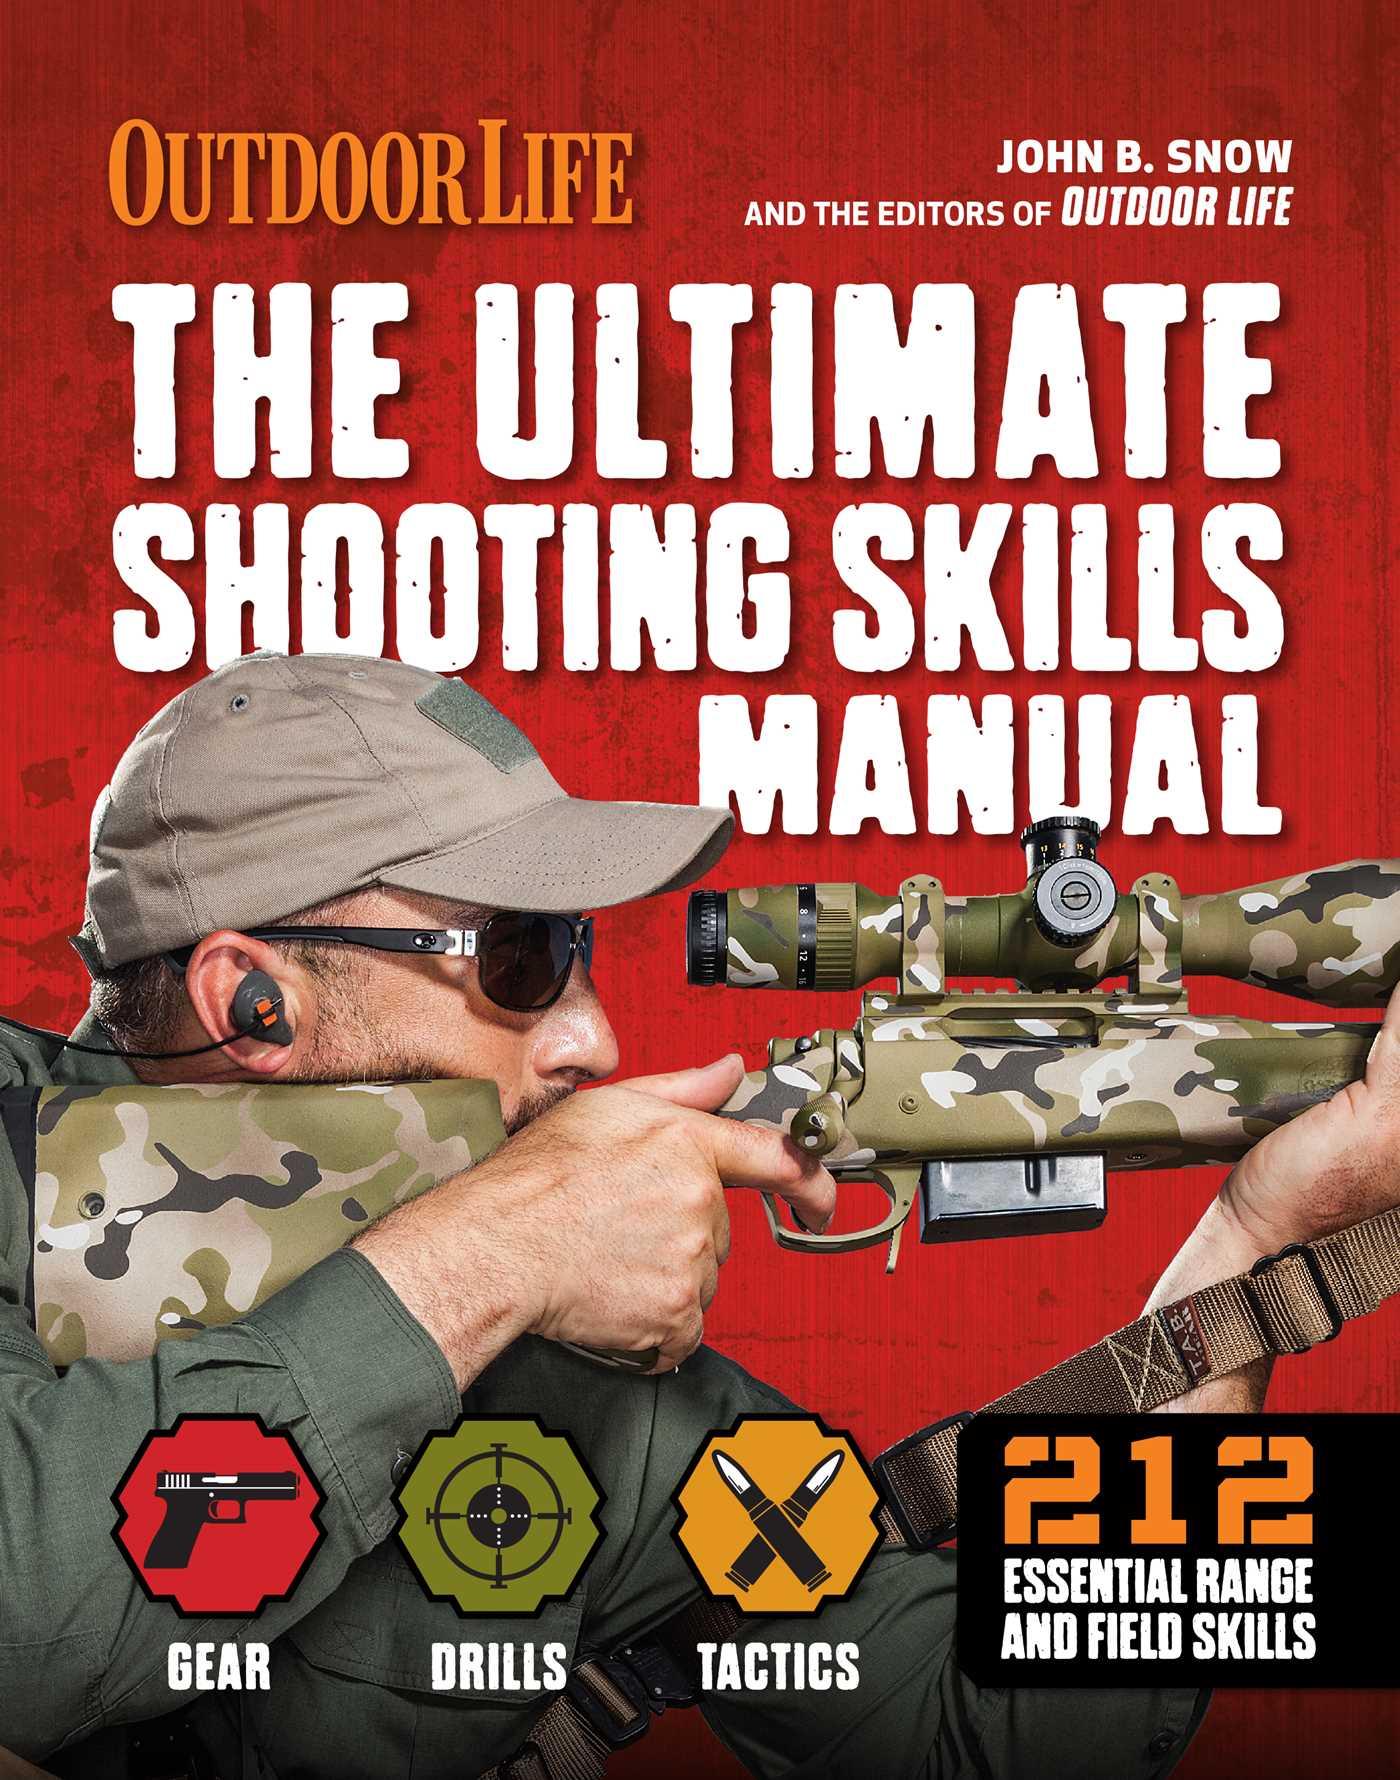 Ultimate shooting skills manual 9781616288327 hr